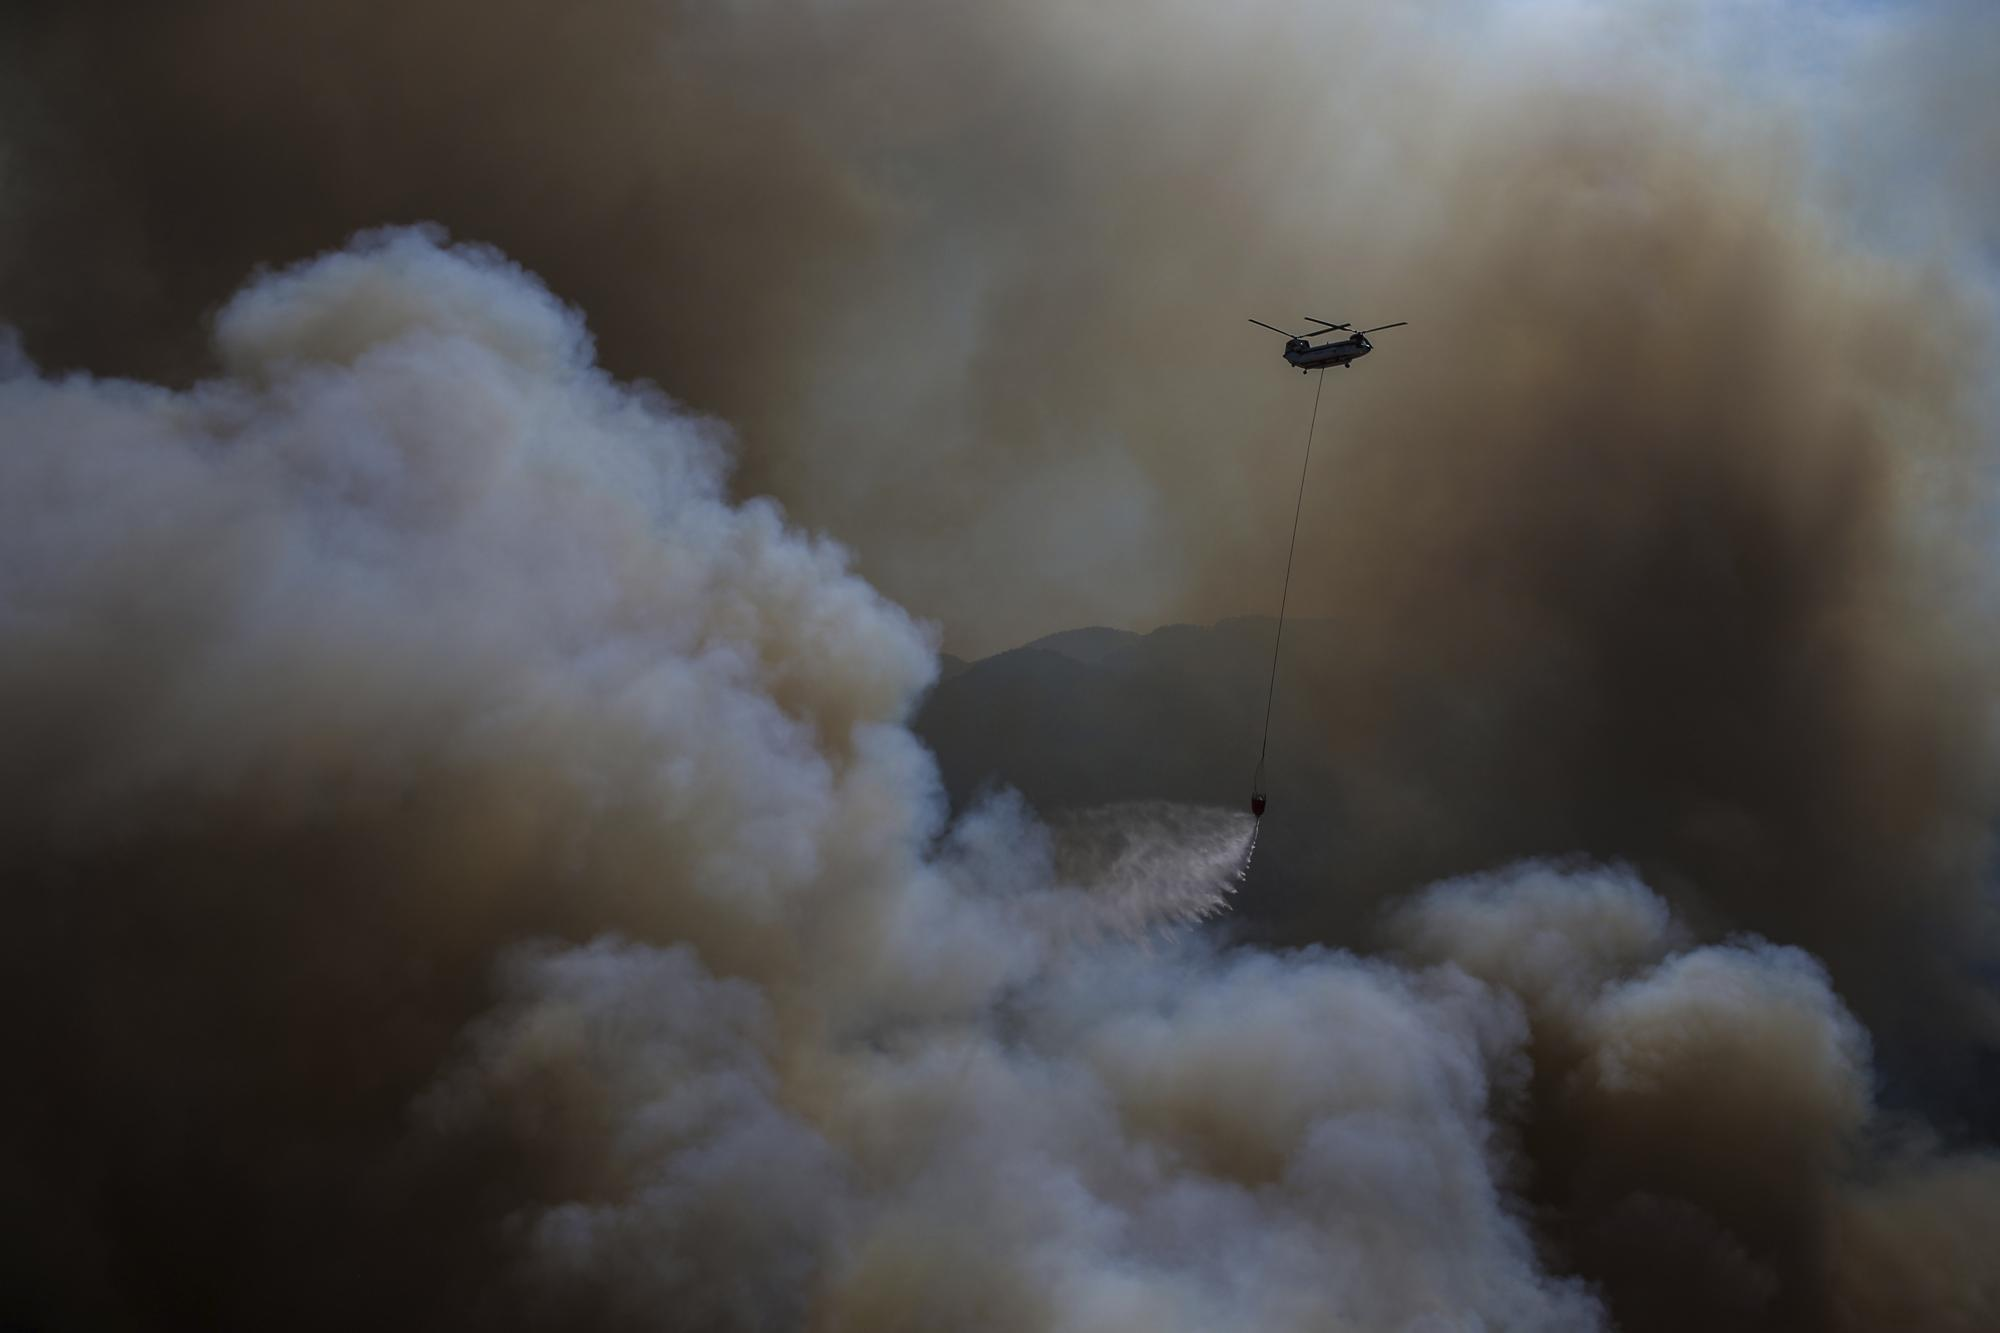 A helicopter drops water over a wildfire in Koycegiz, Mugla, Turkey, Monday, Aug. 9, 2021. (AP Photo/Emre Tazegul)